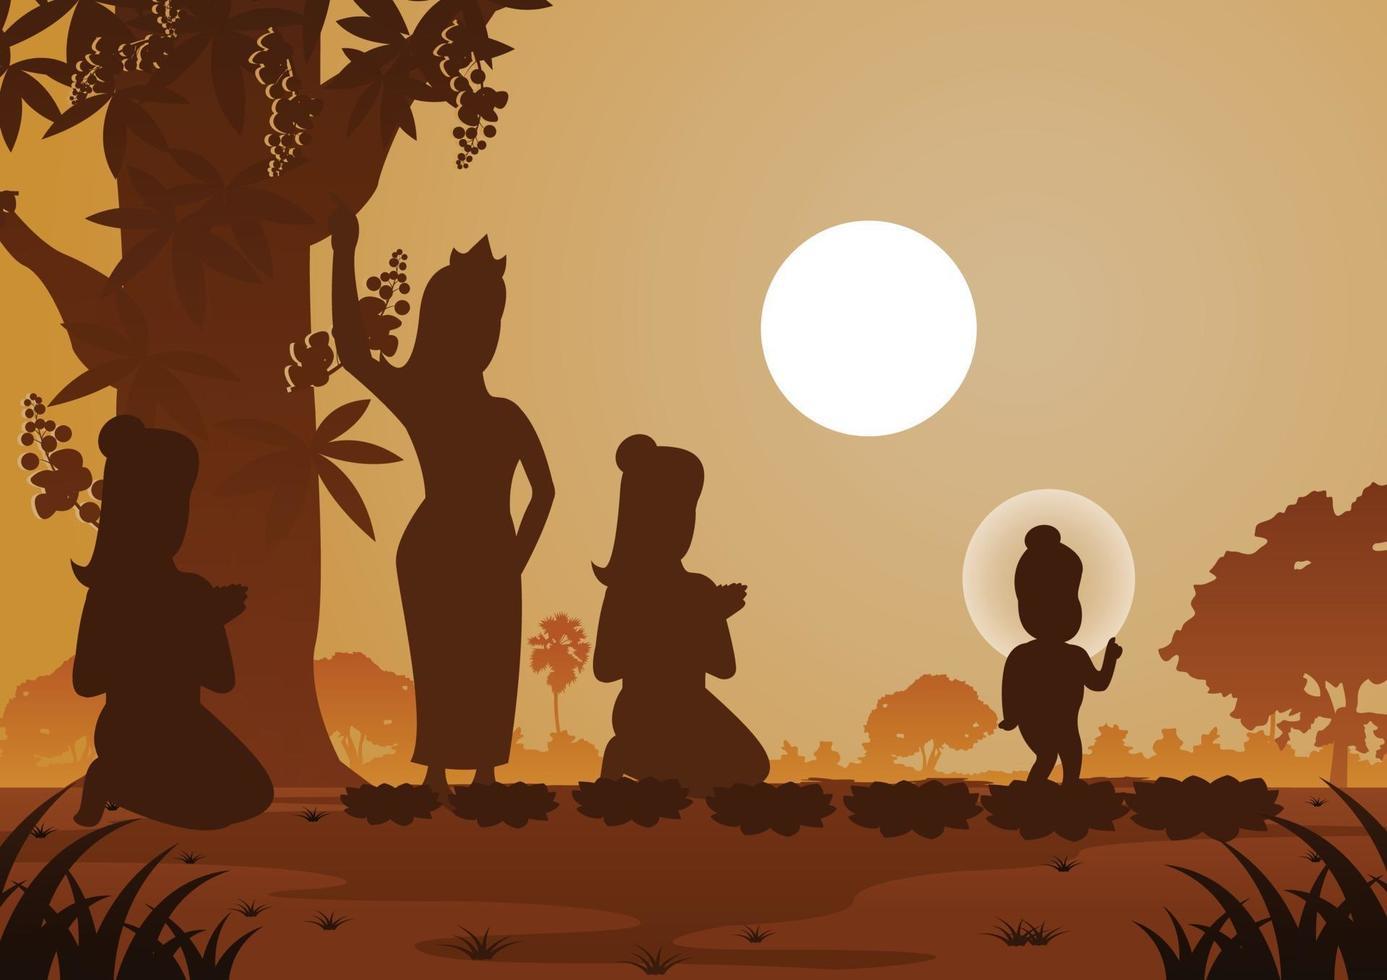 Story of Buddha born under a tree vector